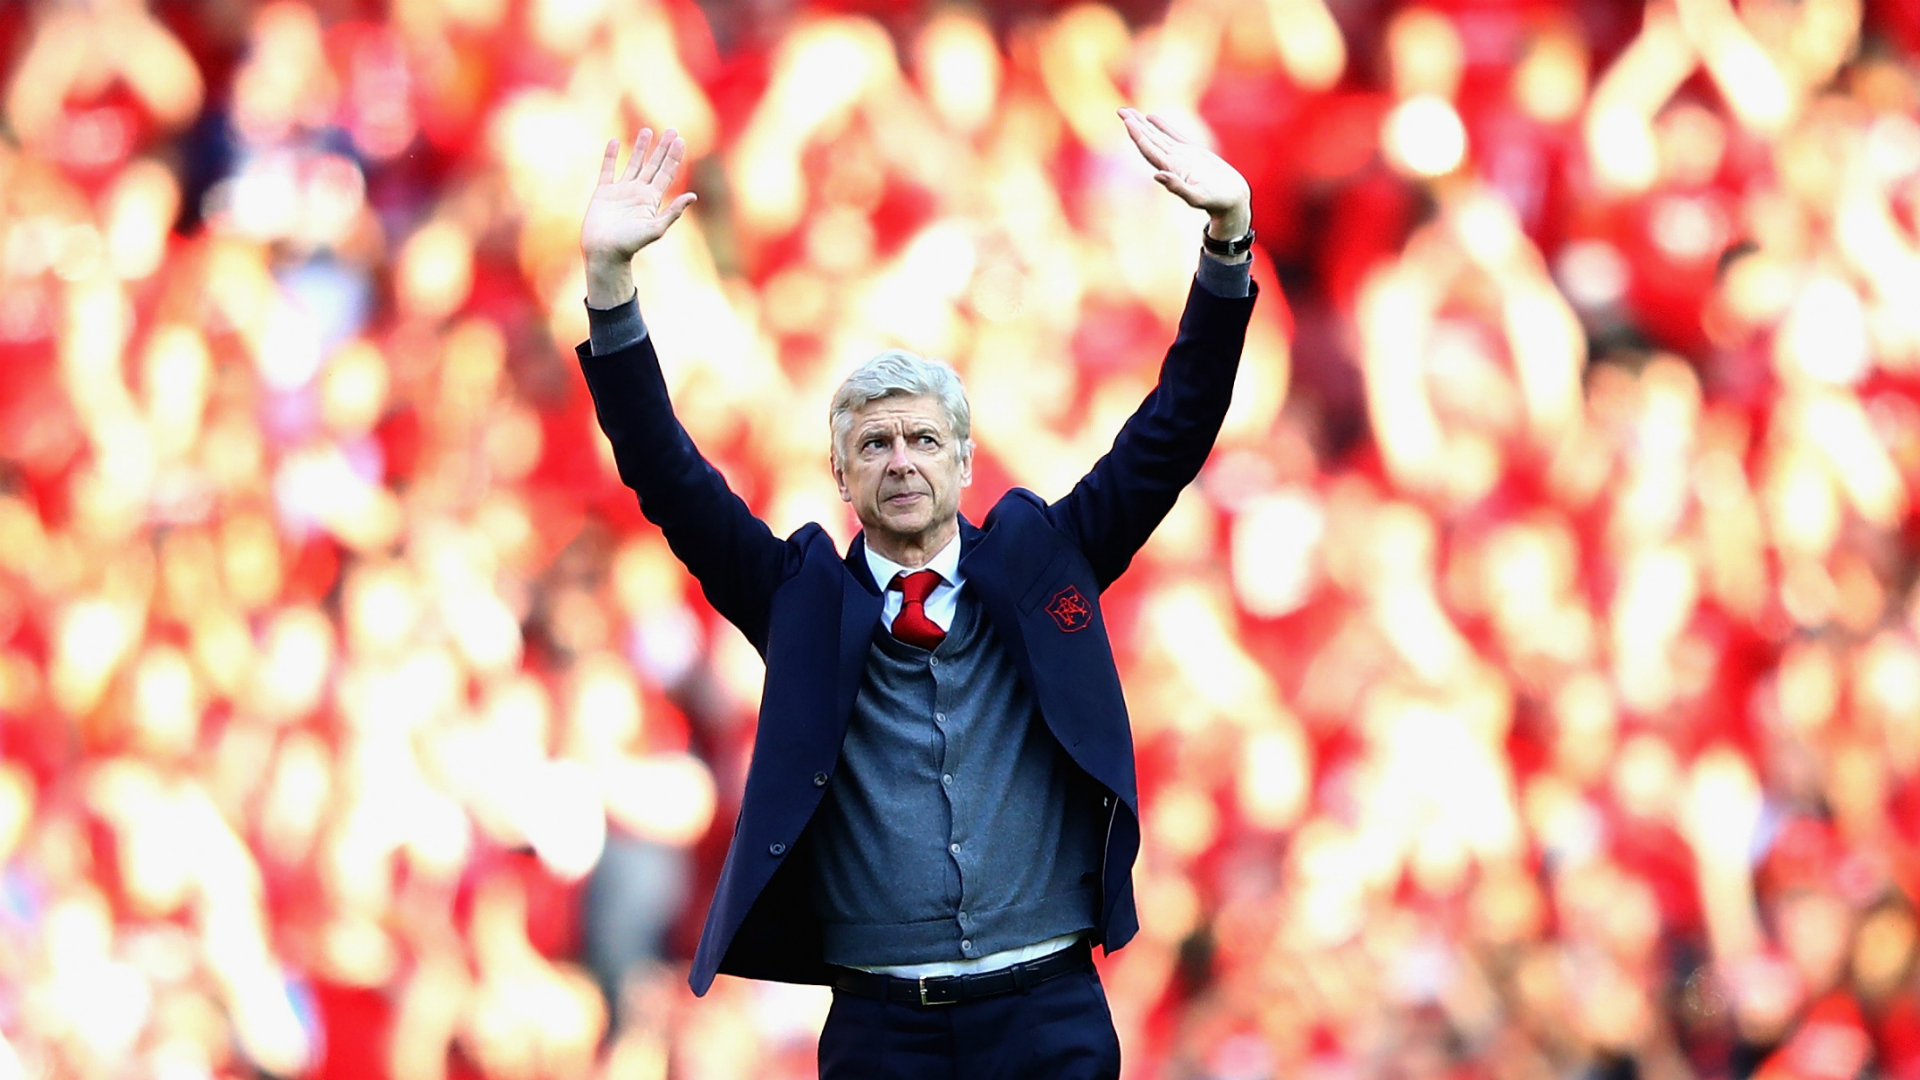 Arsenal-manager-arsene-wenger_1wcdgqfm3ingg1pvi4by5vlrrv